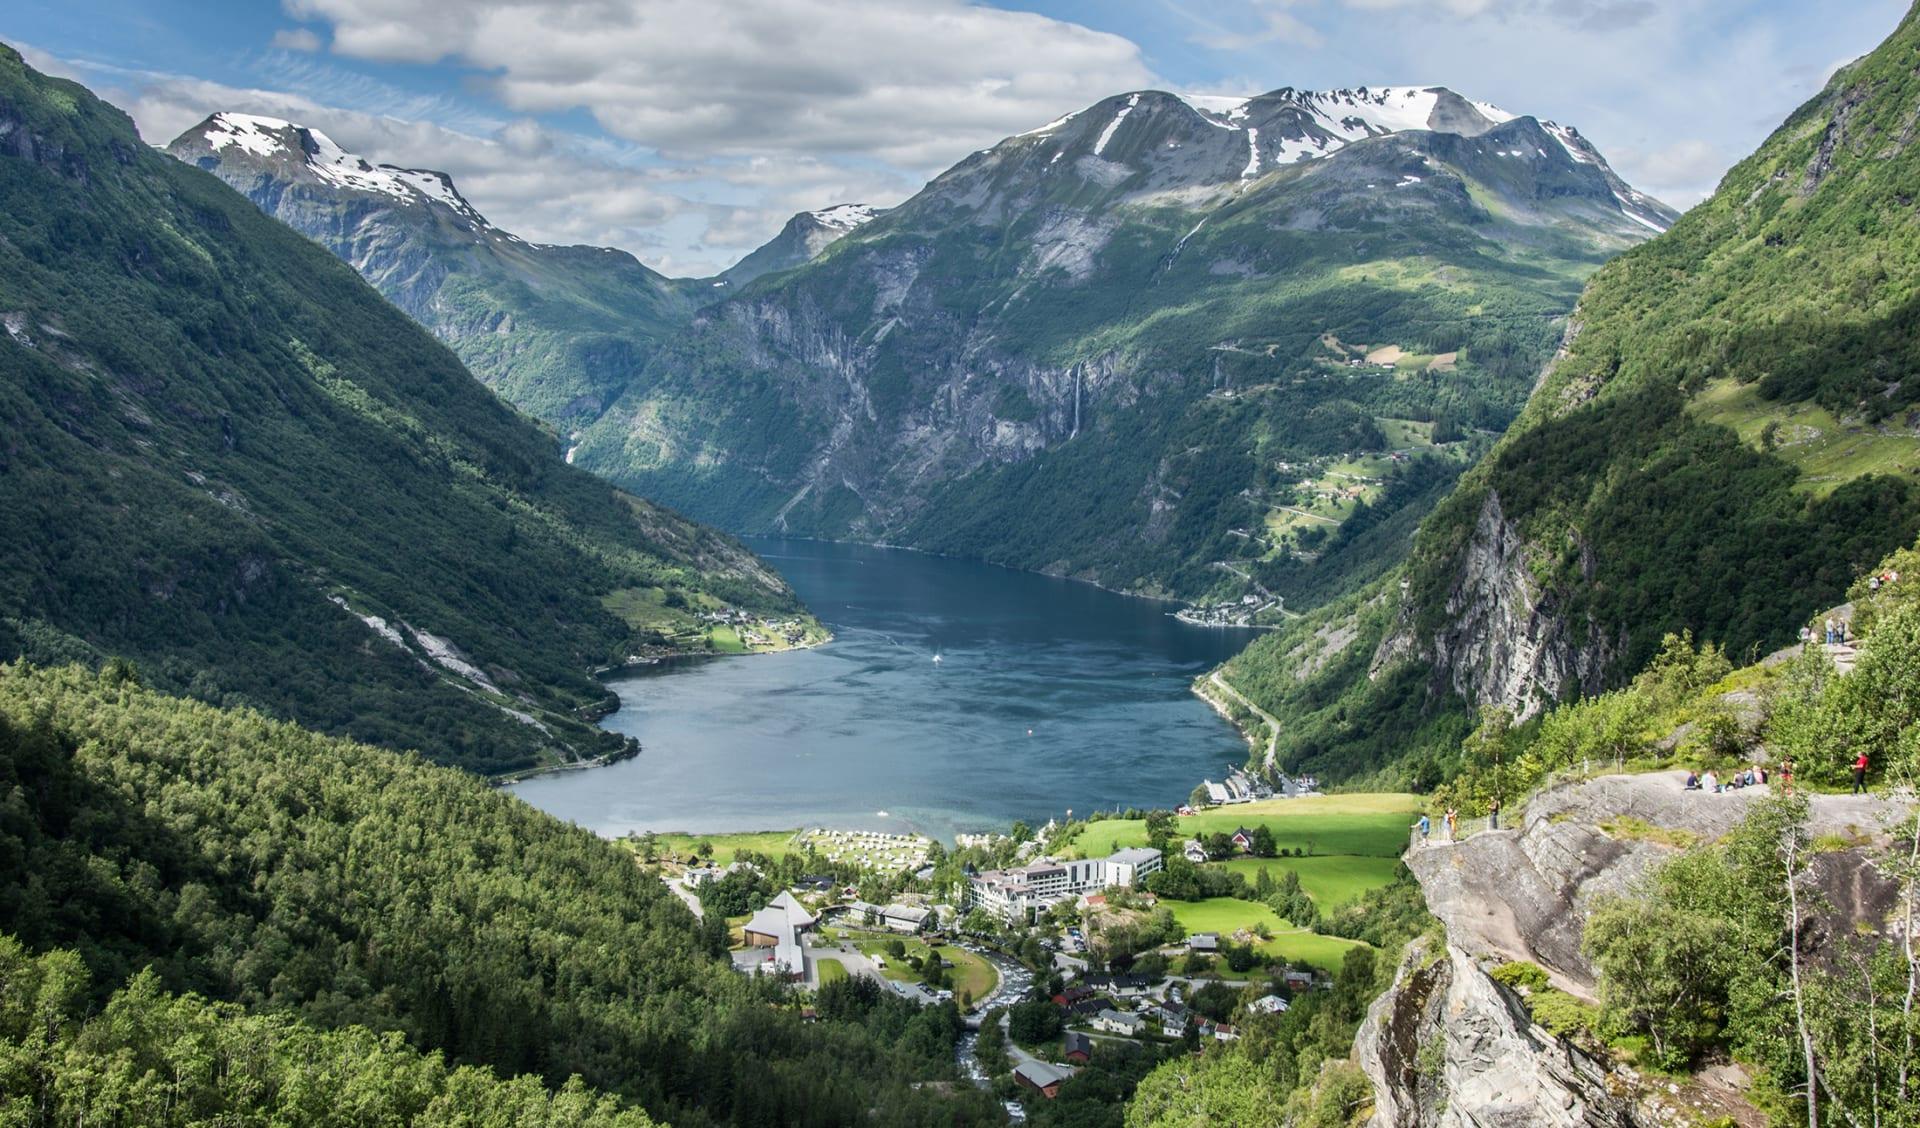 Geirangerfjord, Skandinavien